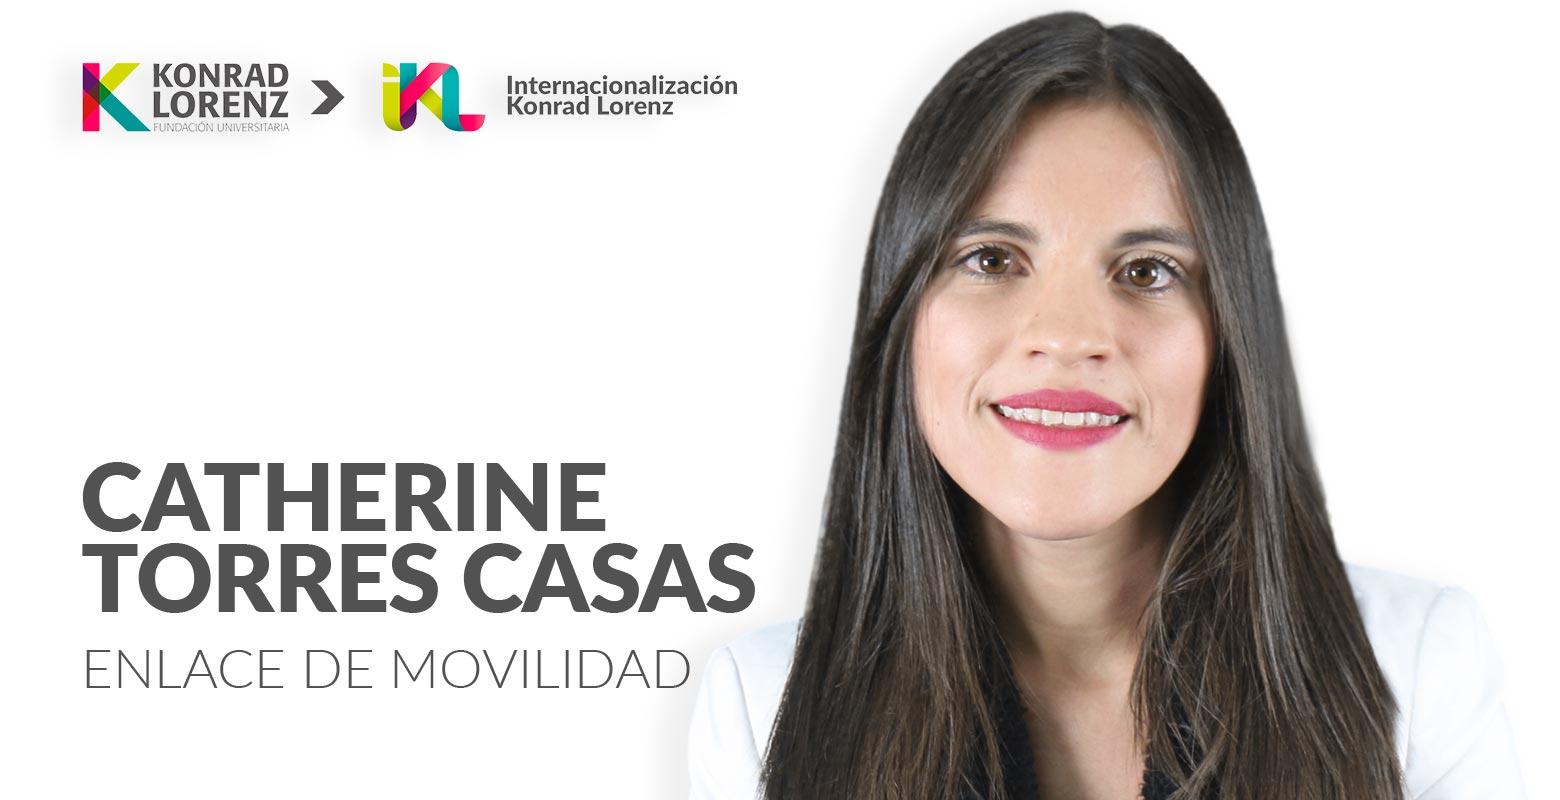 Catherine Torres Casas